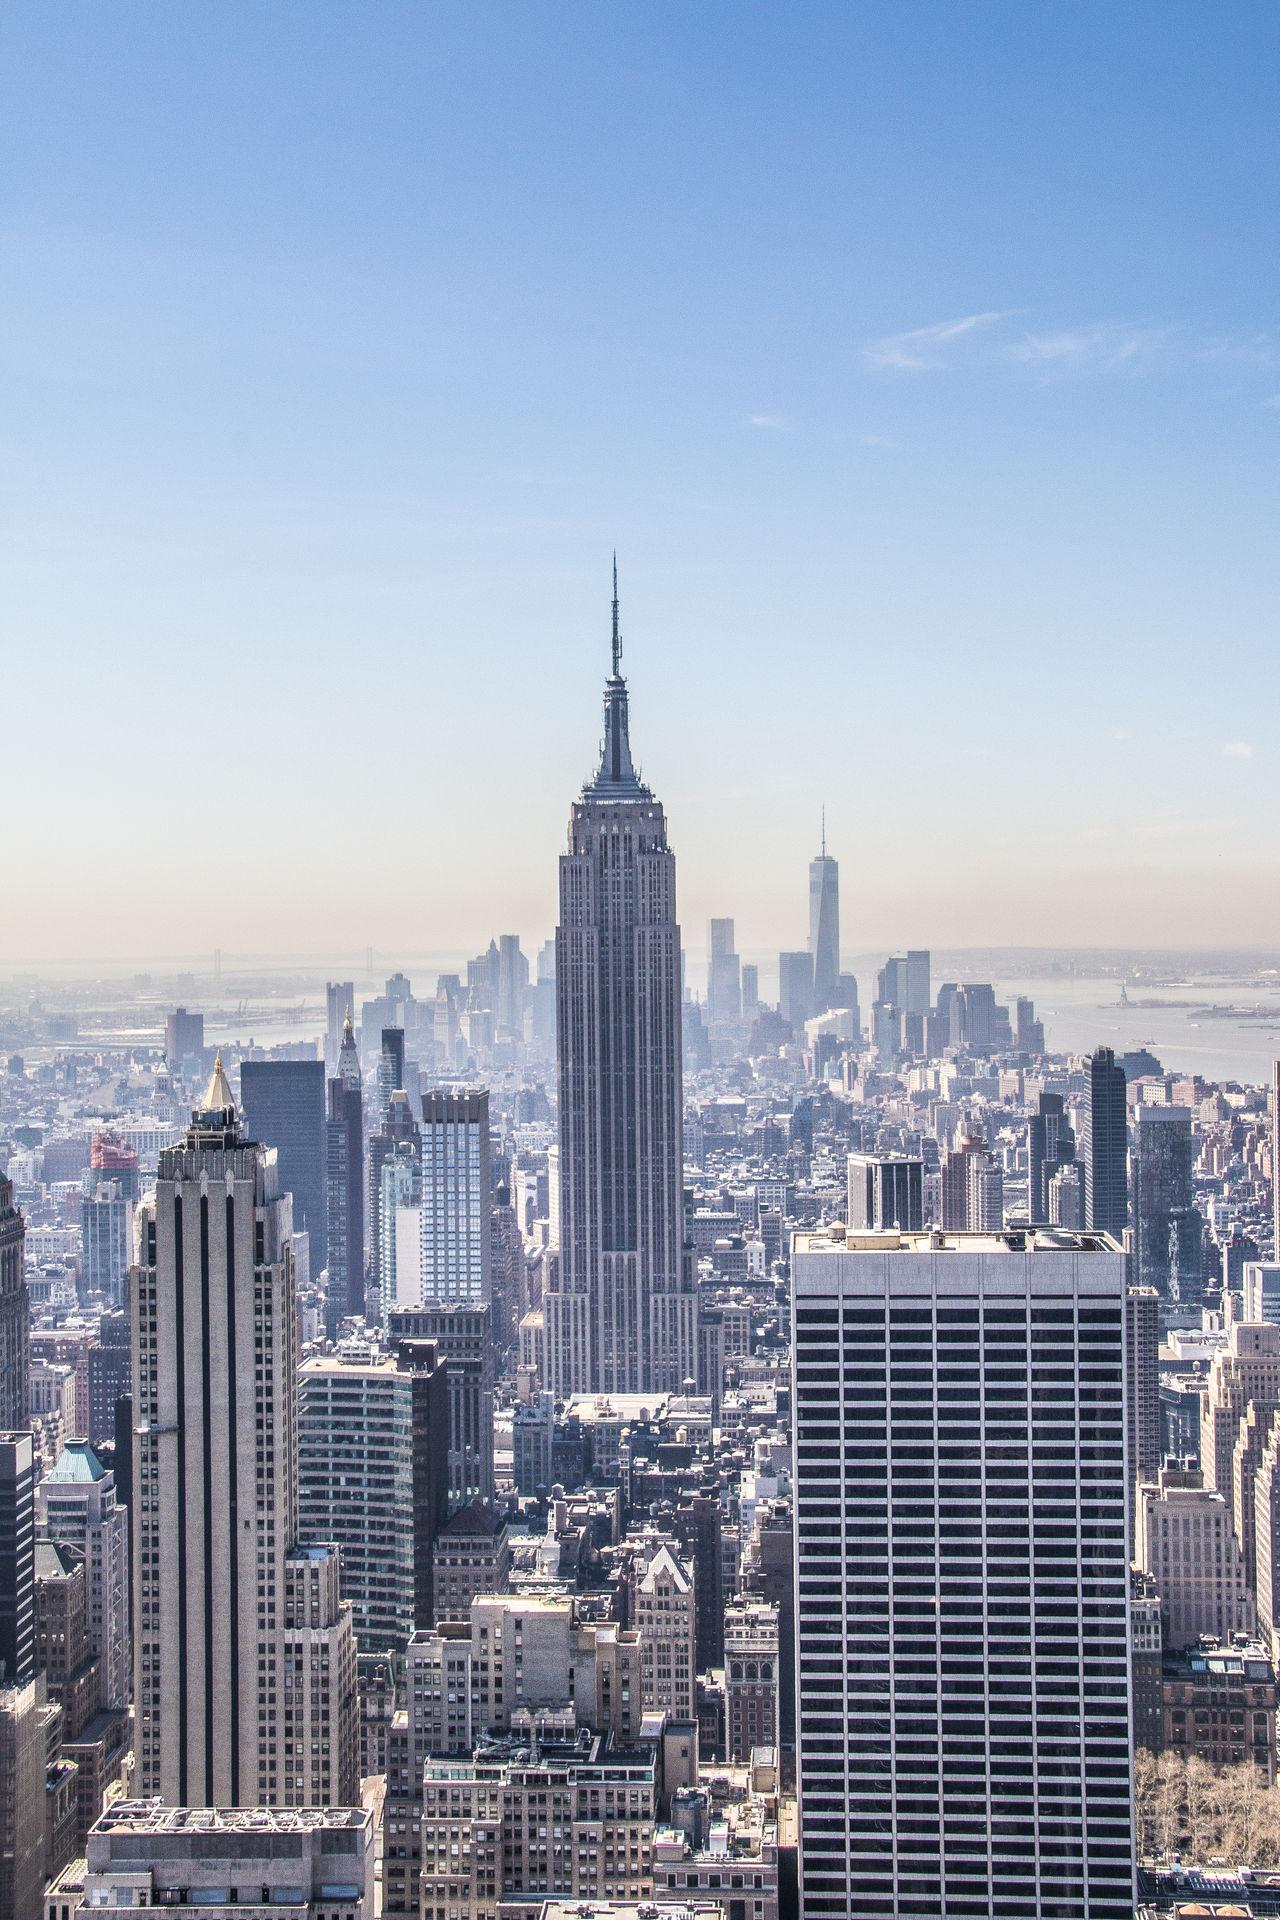 Empire State Building Empirestate Top Of The Rock South Manhattan New York Manhattan